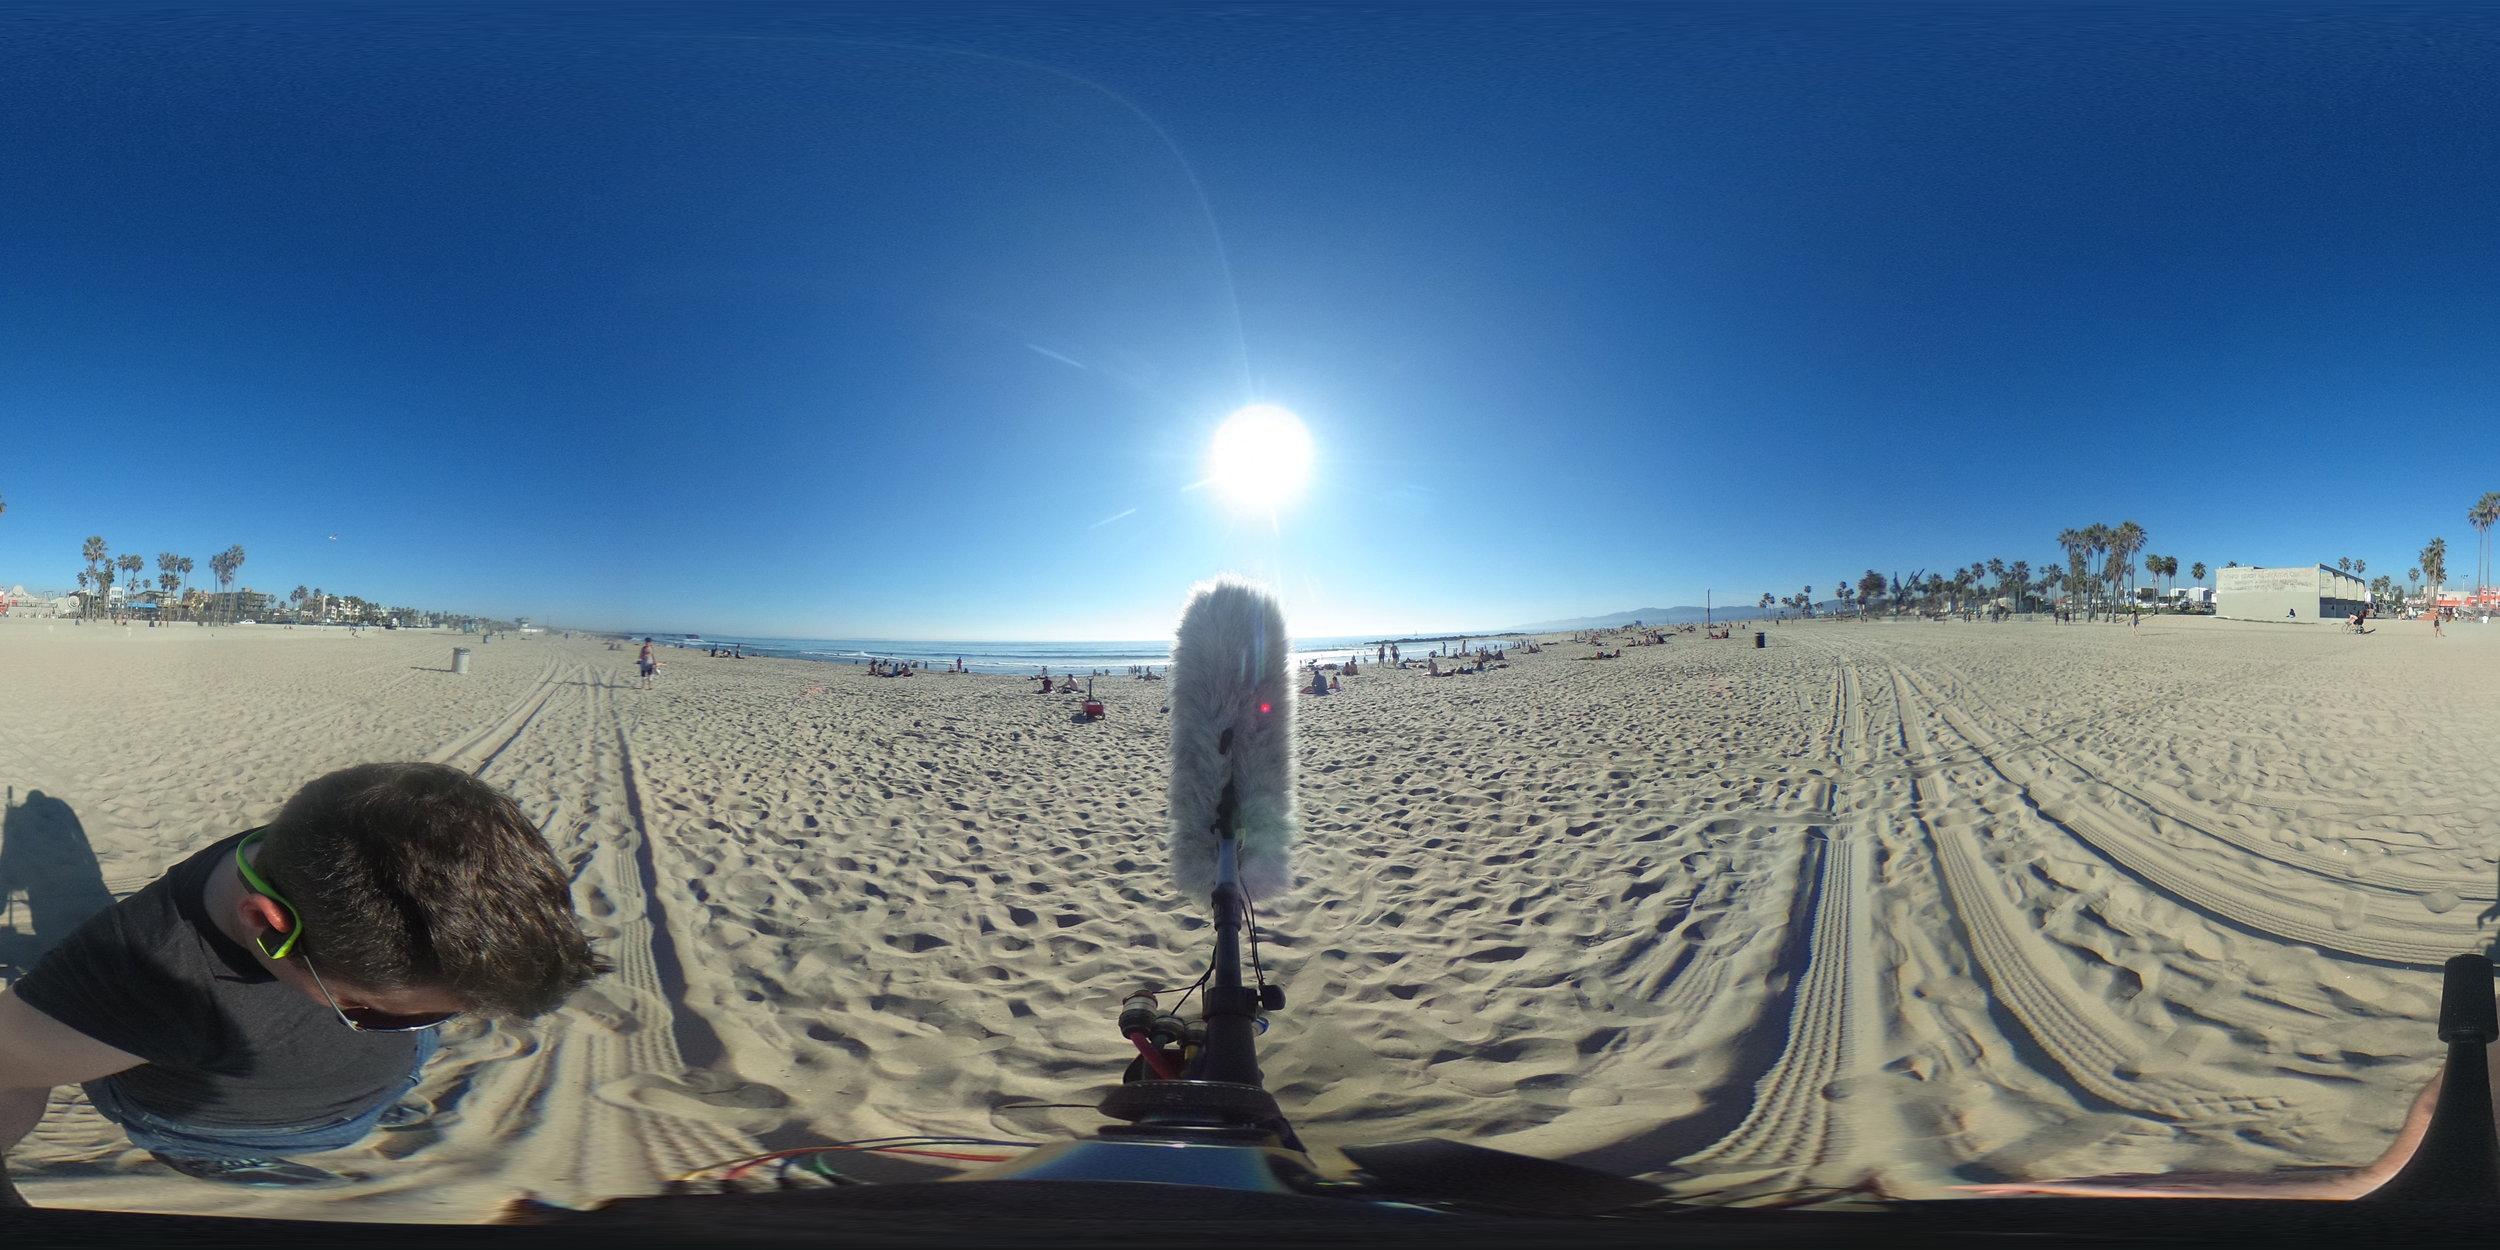 EXT_Day_Beach_MediumWaves_DistinctVoices_FrisbeePlaying_HelicopterBy_WalkingOnSand_MediumToDistantWaves_LifeguardTruckBy_JPEG.JPG